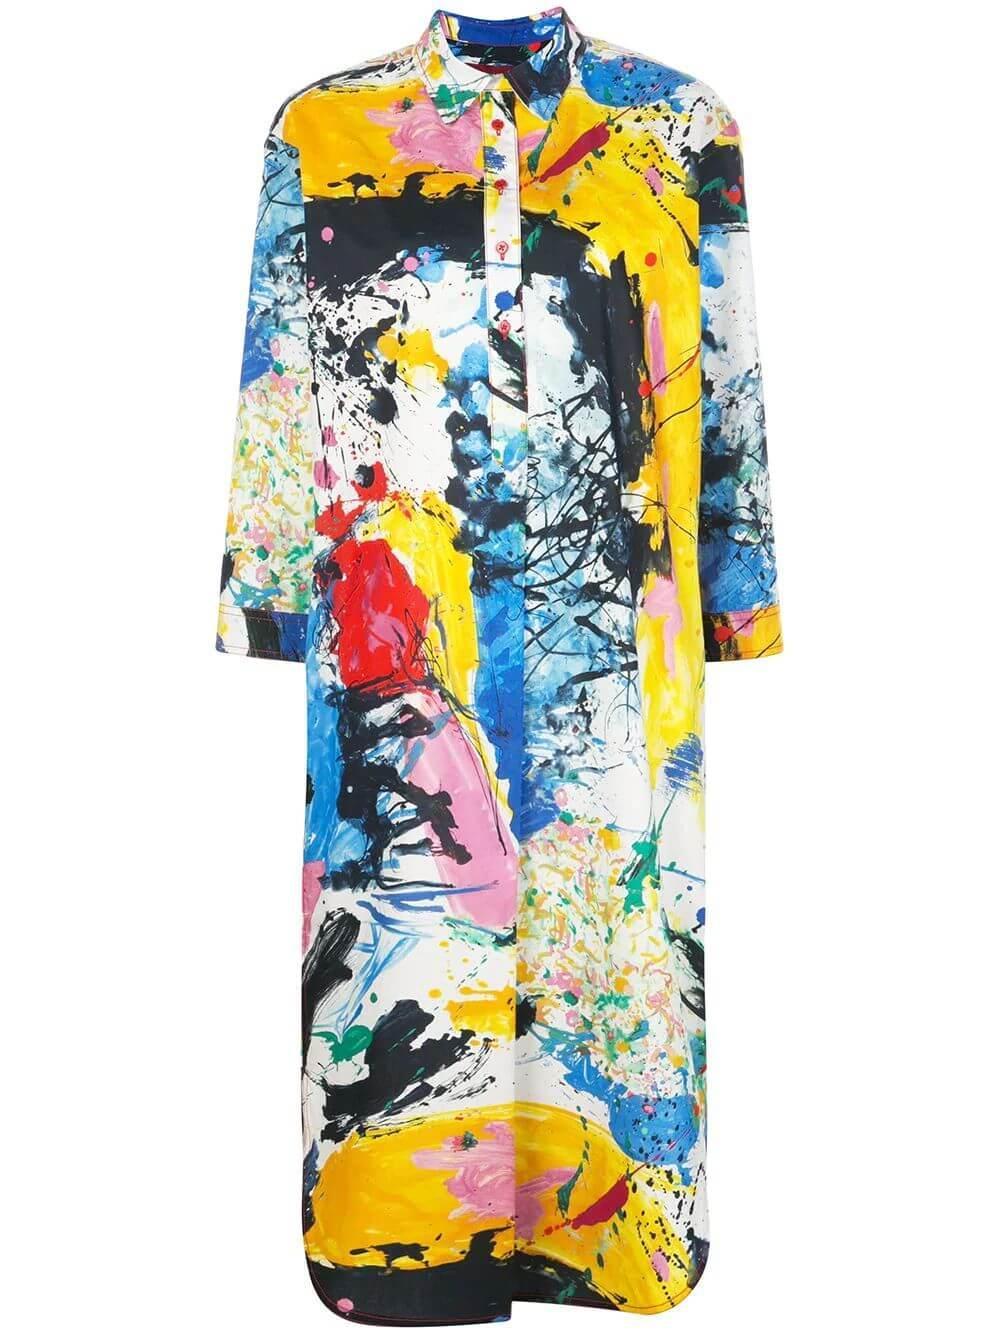 Ina Long Sleeve Printed Cotton Shirt Dress Item # 16GM5270-00C119